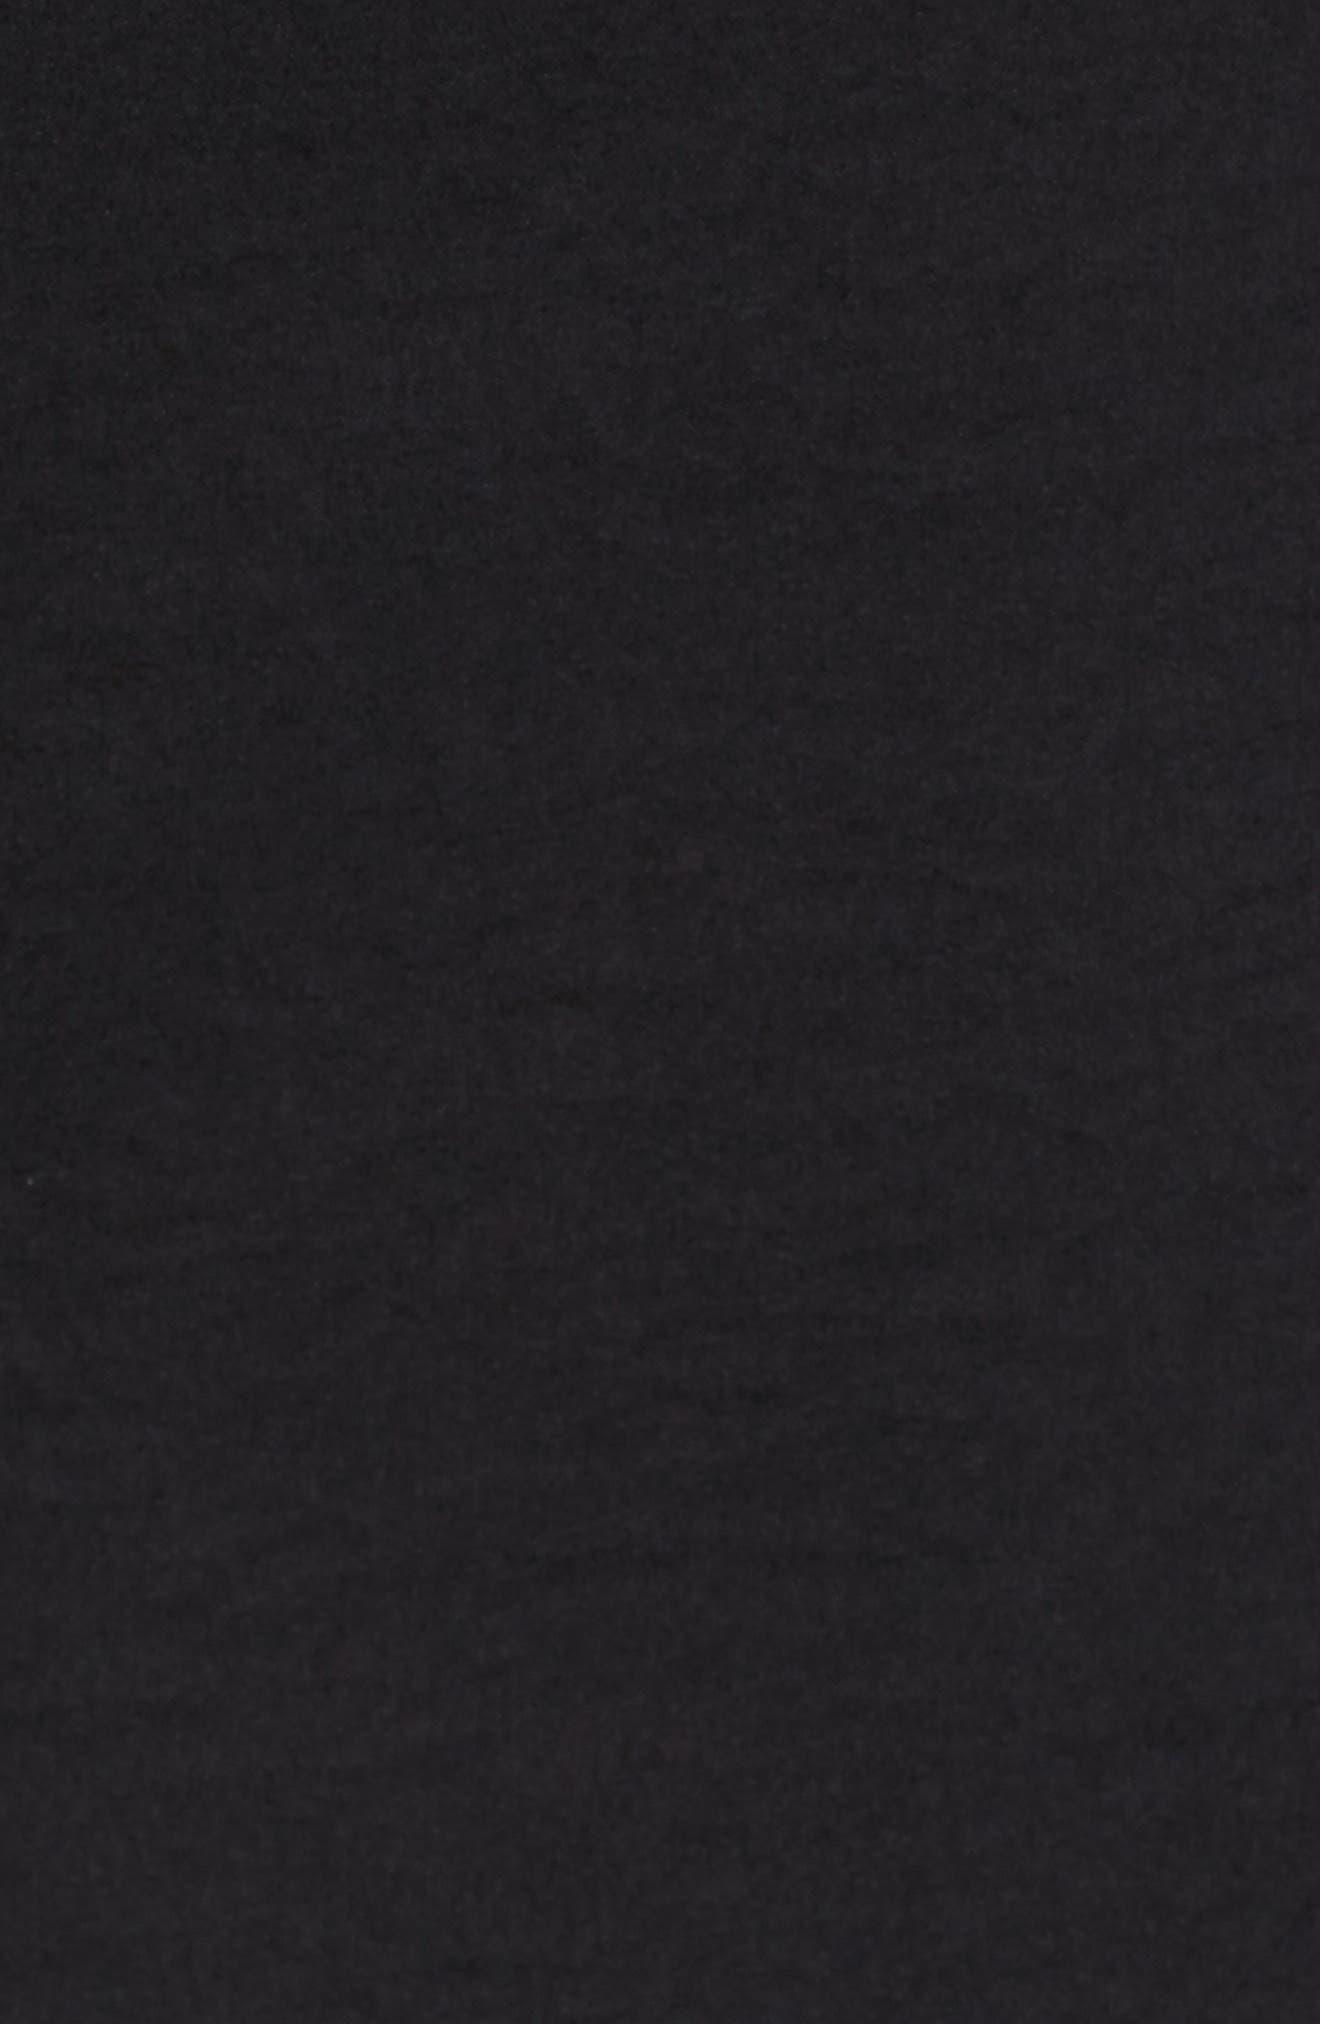 Satin Bell Sleeve Top,                             Alternate thumbnail 5, color,                             Black